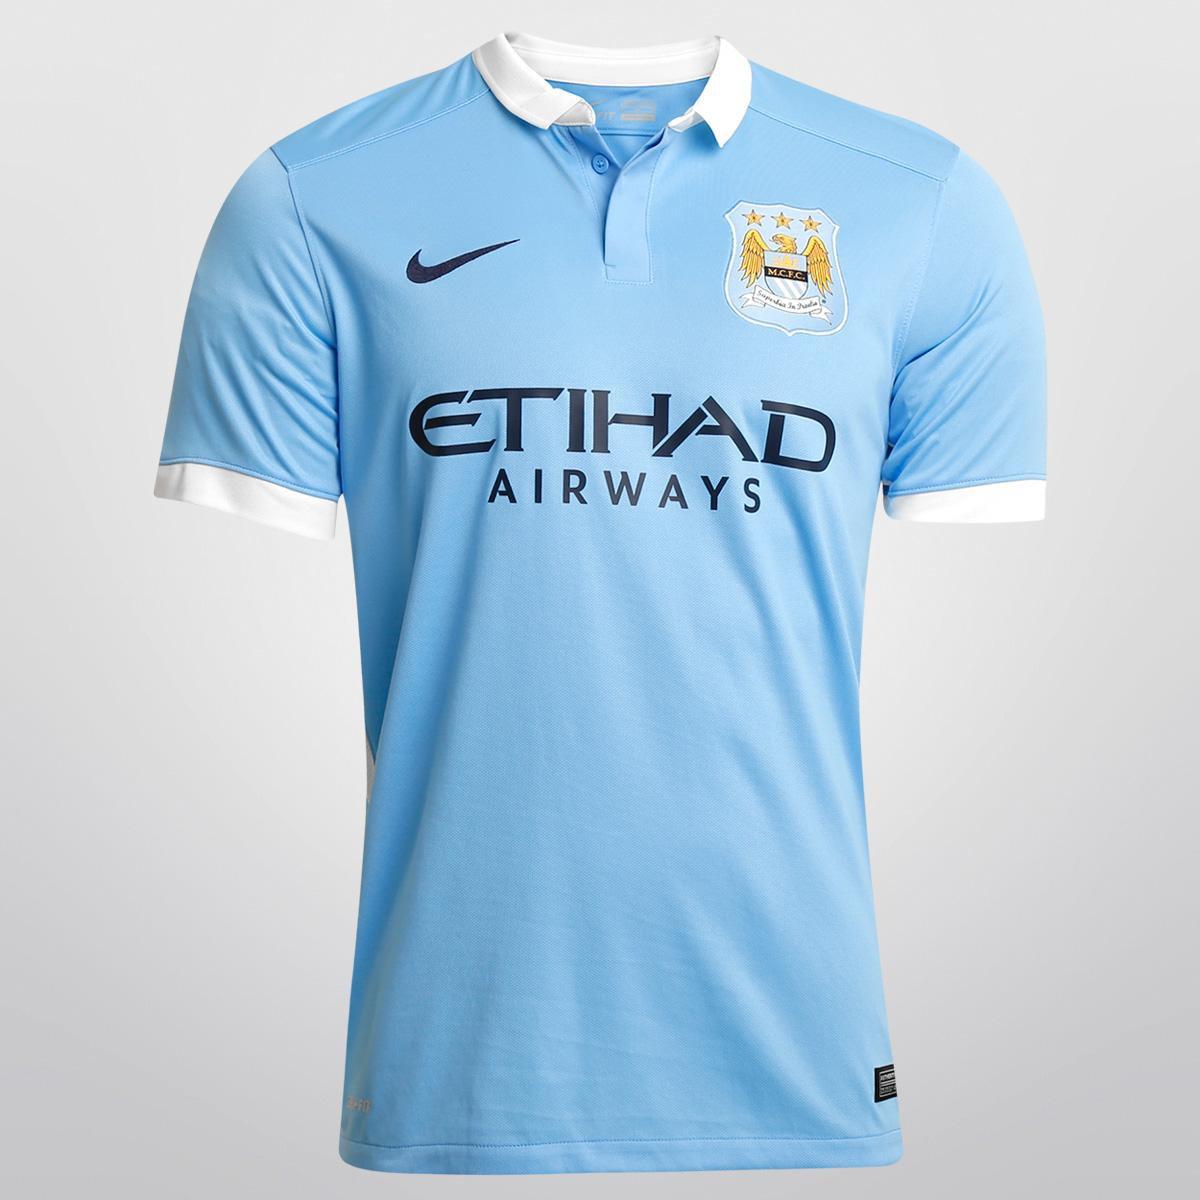 75ac10e4acf9f Camisa Nike Manchester City Home 15/16 s/nº | Netshoes